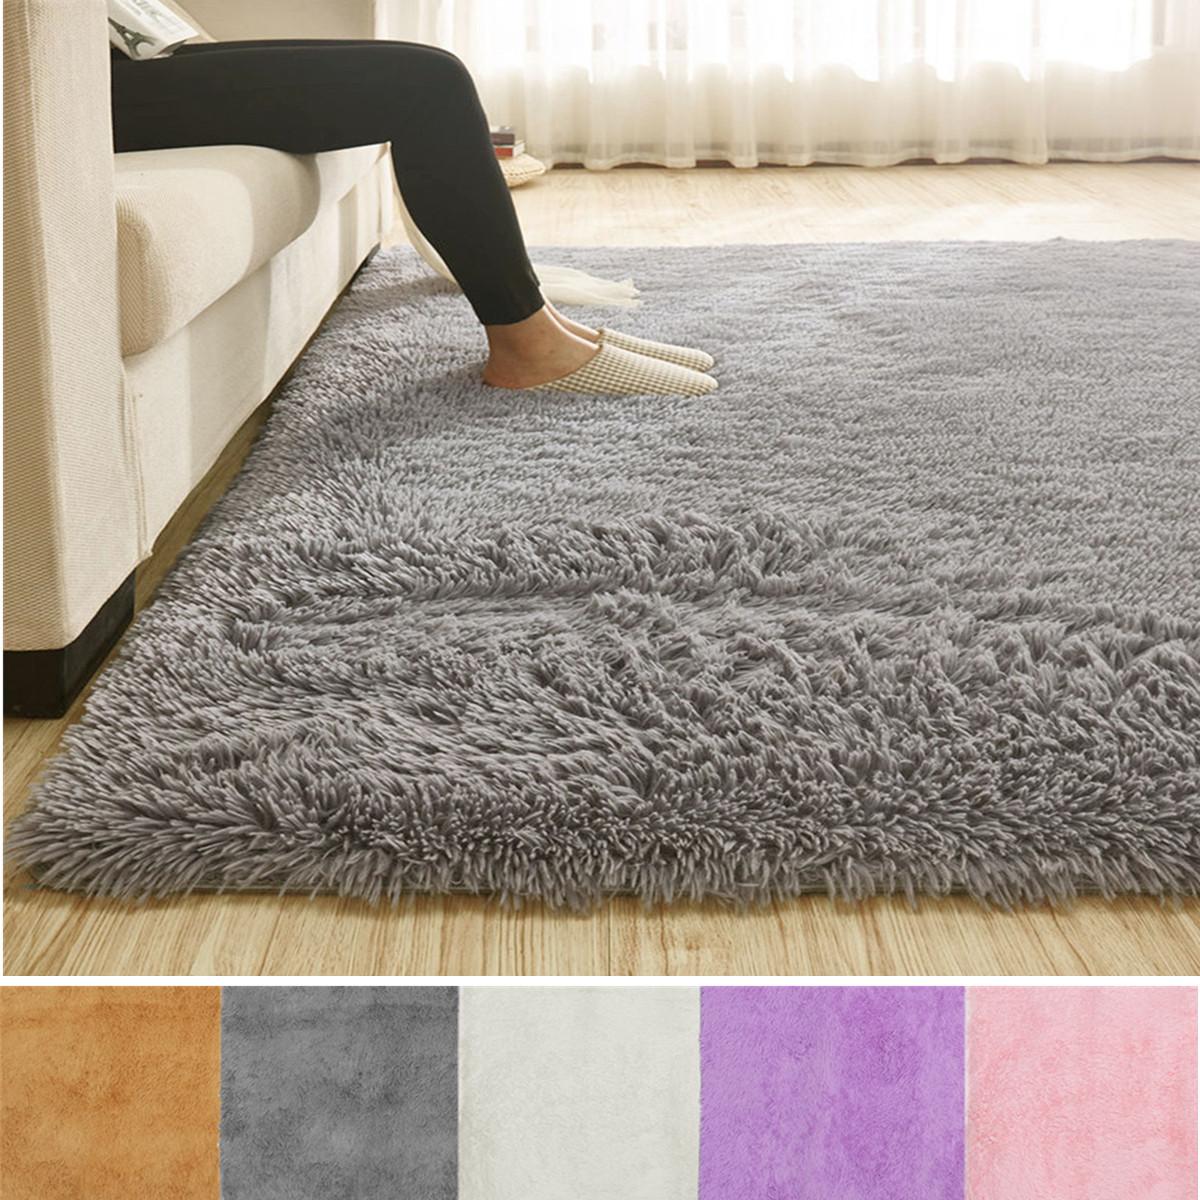 Unicorn Carpet Area Rug Floor Mat Children Bedroom Living Dining Room Bath Dec X